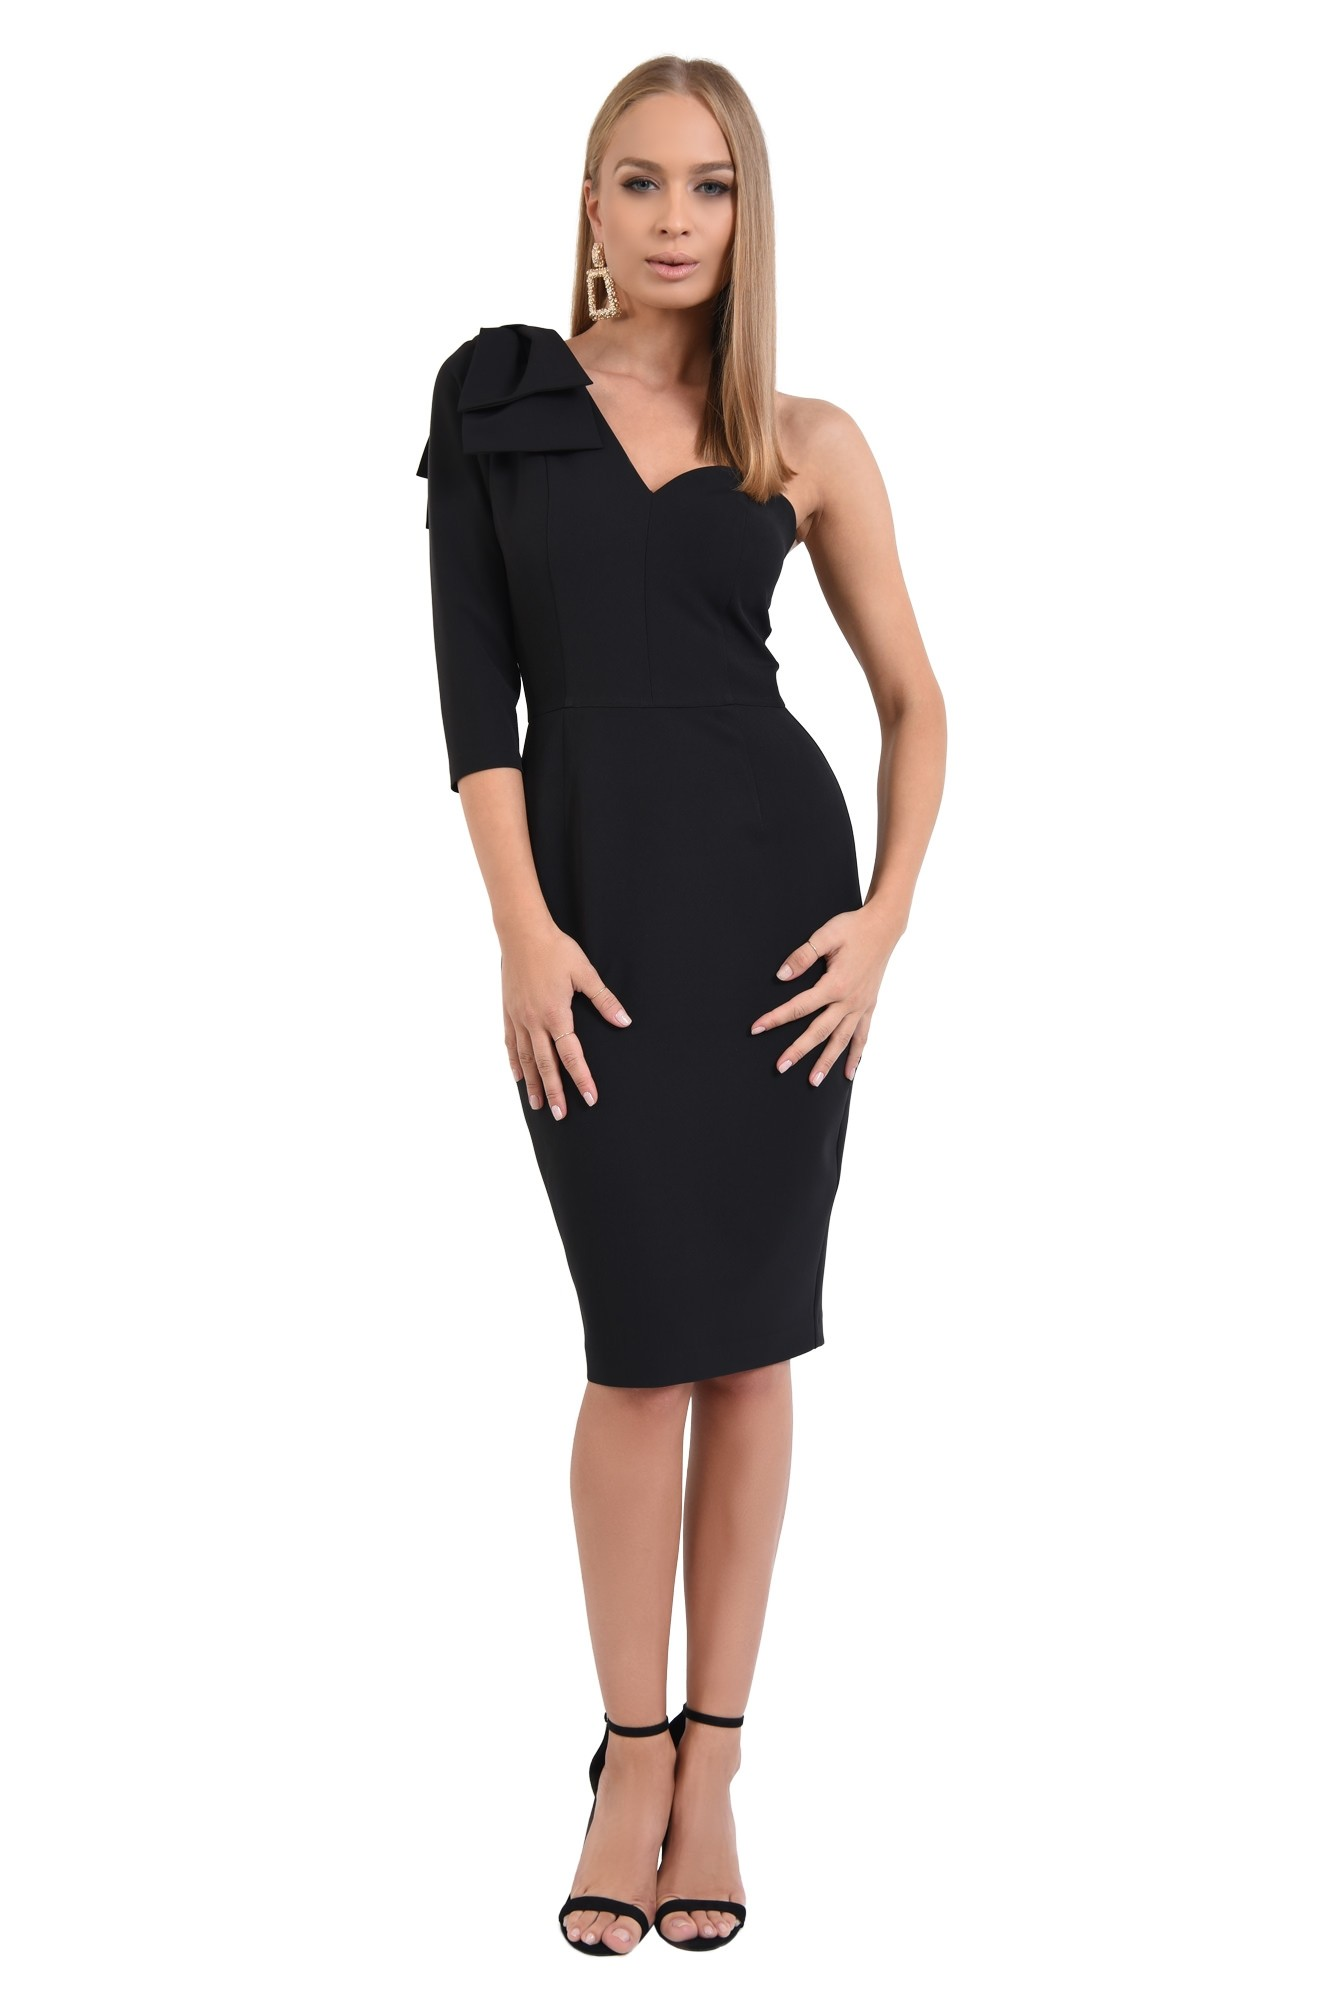 360 - rochie eleganta, conica, neagra, funda suprapusa la umar